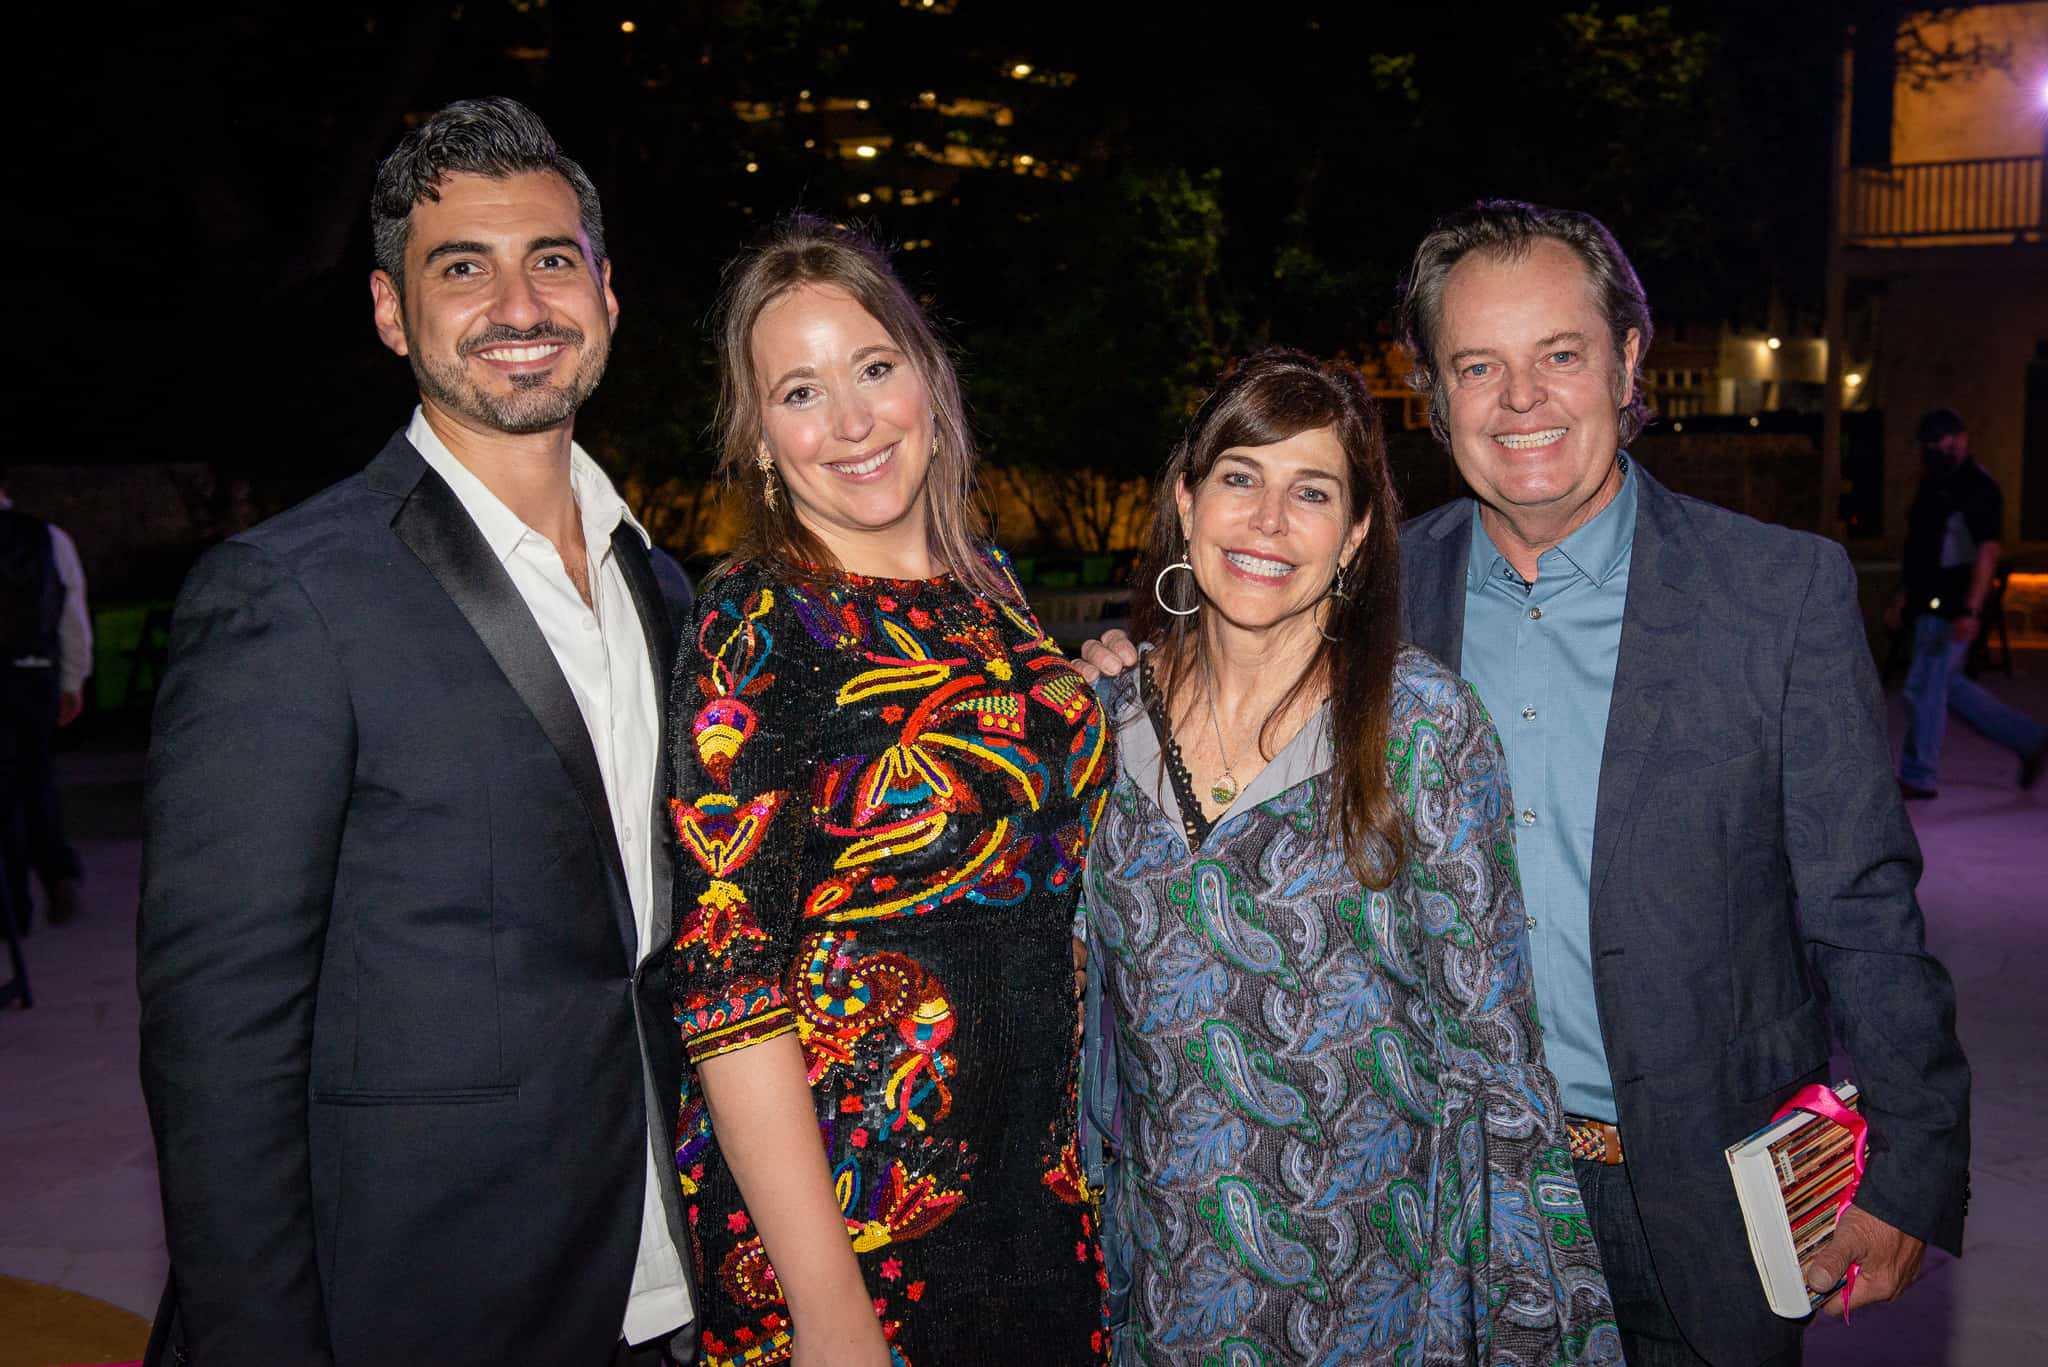 Carlos Solis, Kim Harle, Lynne Dobson and Greg Wooldridge